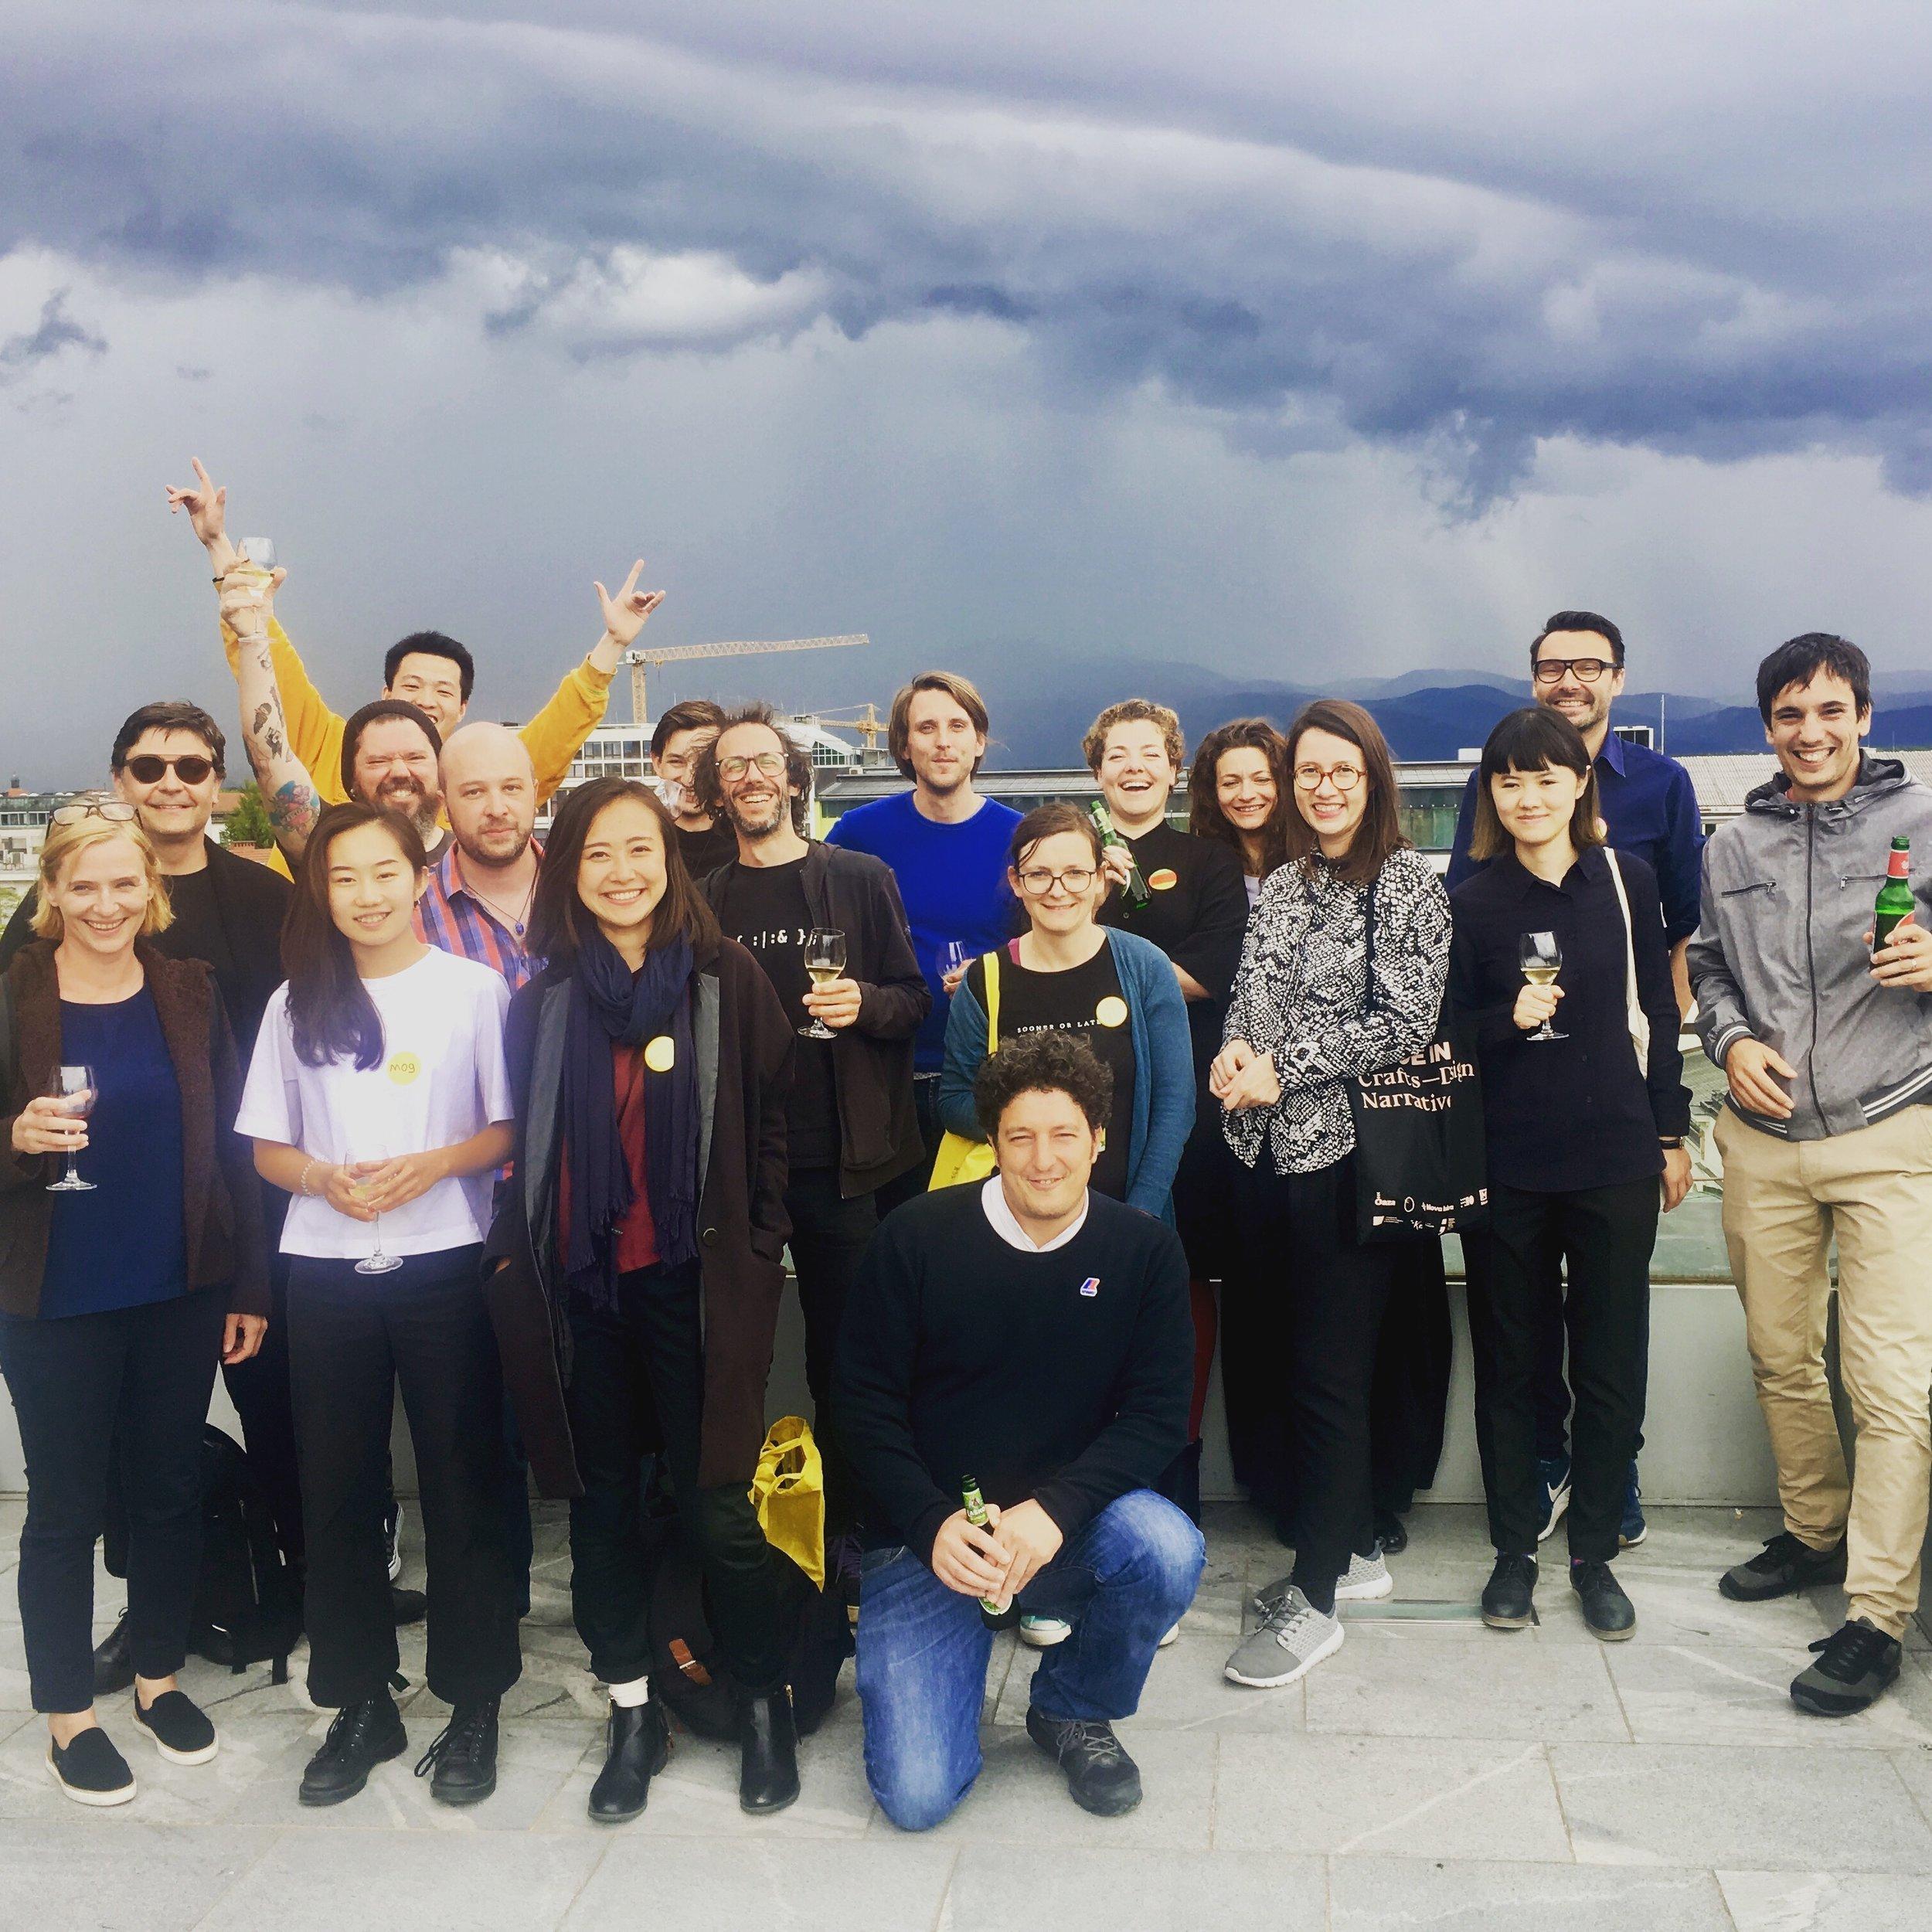 BIO26 participants for challenge: LIBRARY, commonplace studio, NUK, the curators Aline Lara Rezende & Thomas Geisler.